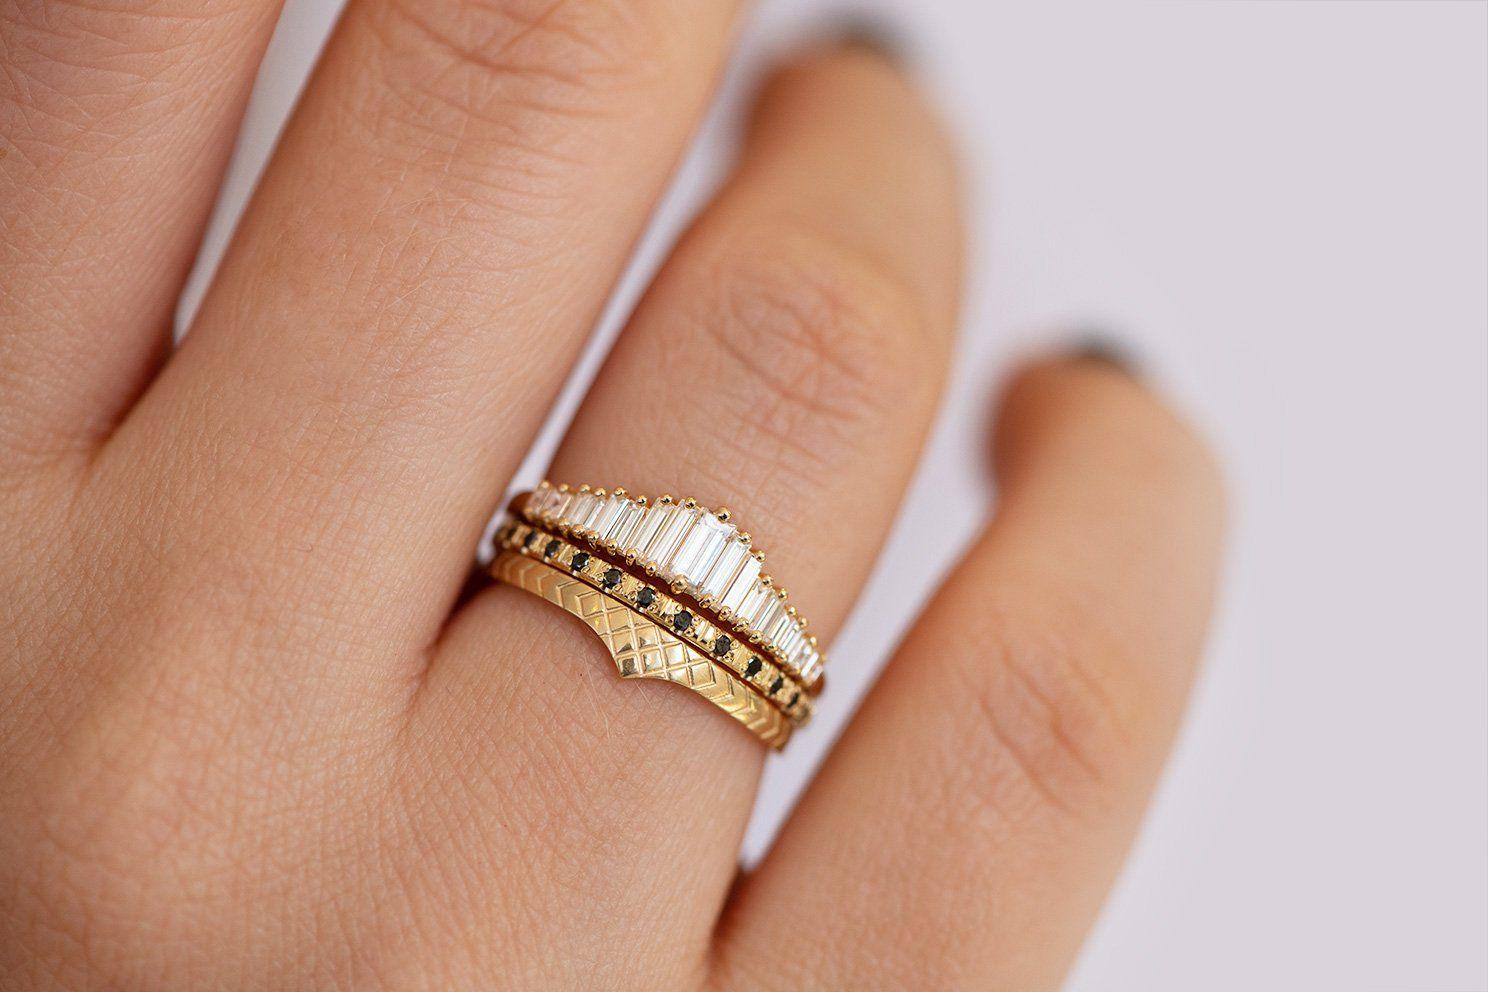 Delicate Wedding Band Patterned Ring Artemer Diamond Wedding Bands Rose Gold Engagement Ring Vintage Engagement Rings